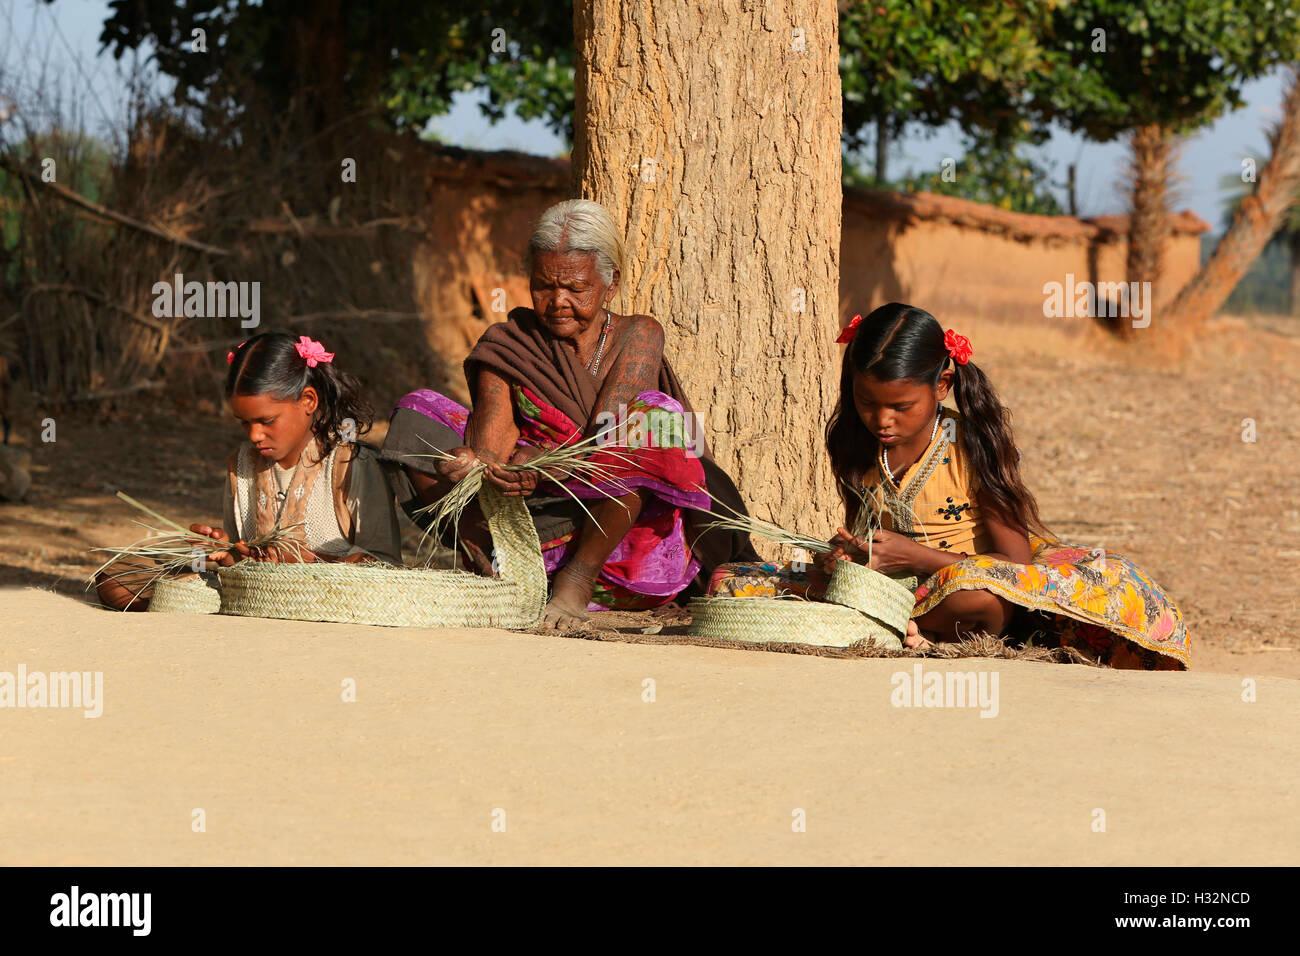 BHUMIA TRIBE, Old woman making bamboo mat, Karma village, Bagicha tahsil, Chattisgarh -India - Stock Image